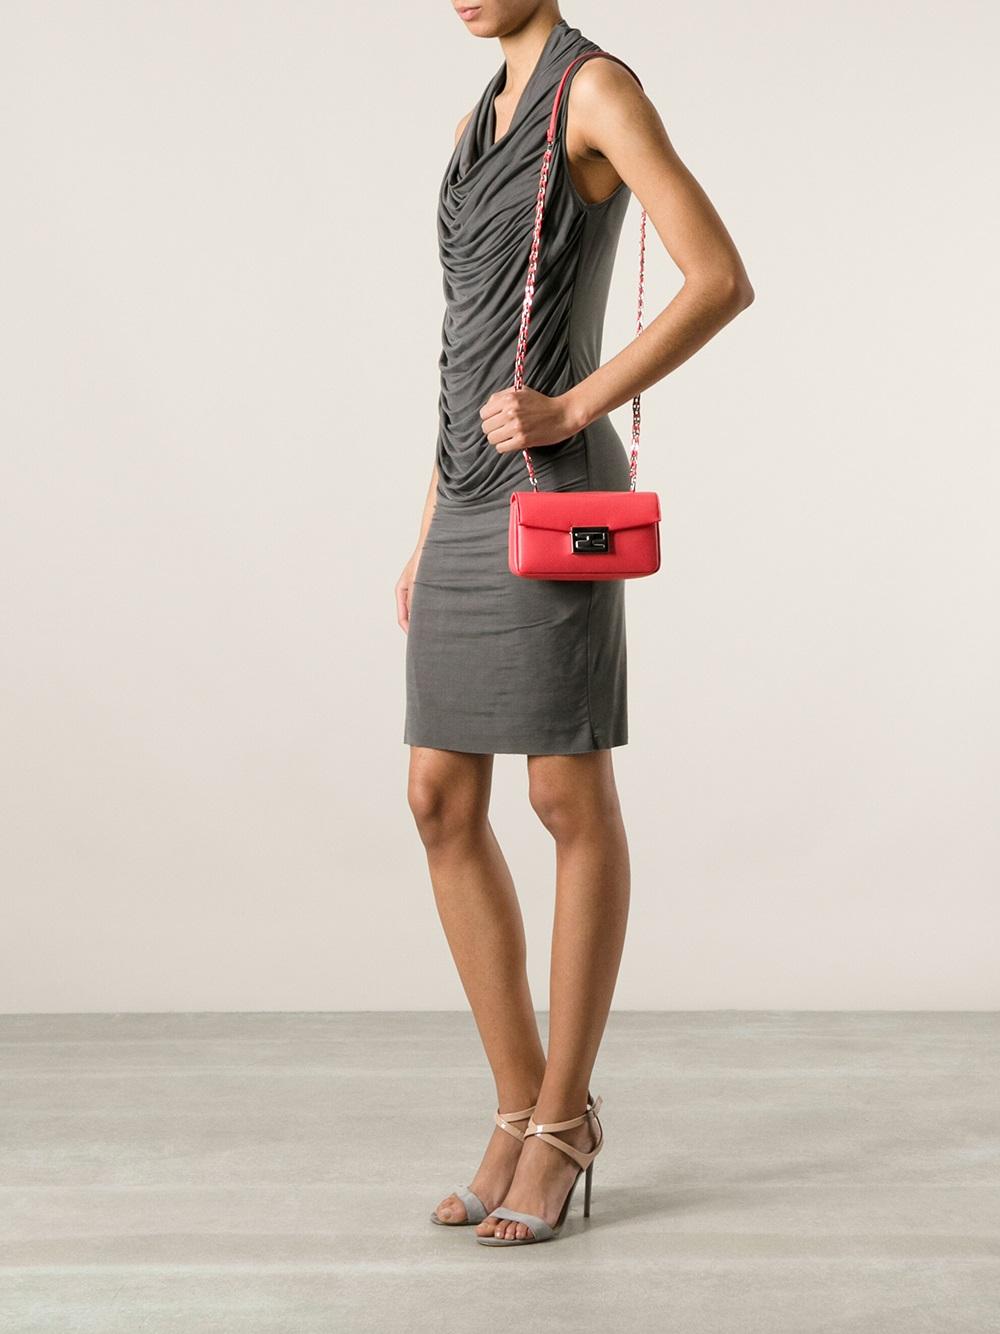 9b8091faf1c7 ... greece lyst fendi mini be baguette shoulder bag in pink 0c83b b6850